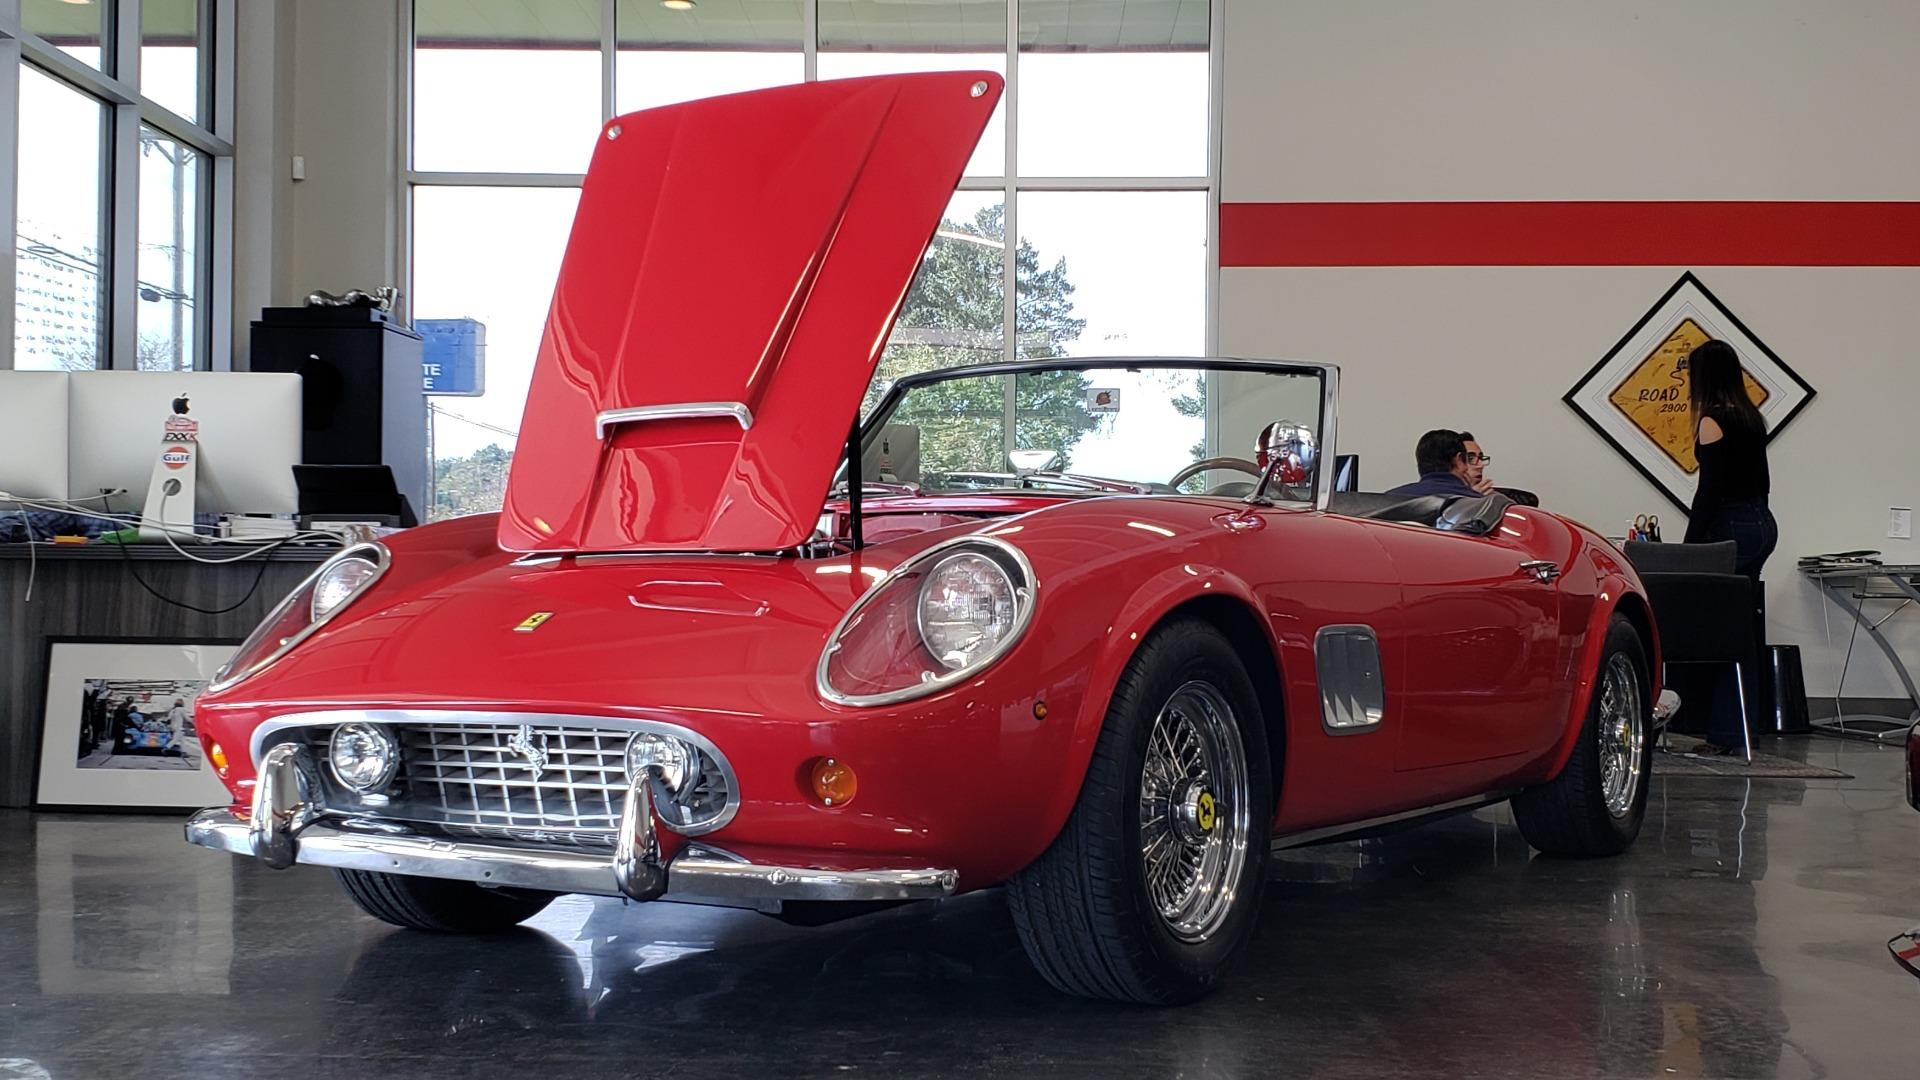 Used 1961 Ferrari 250GT SWB CALIFORNIA REPLICA / 302CI V8 / TREMEC 5-SPEED for sale Sold at Formula Imports in Charlotte NC 28227 76